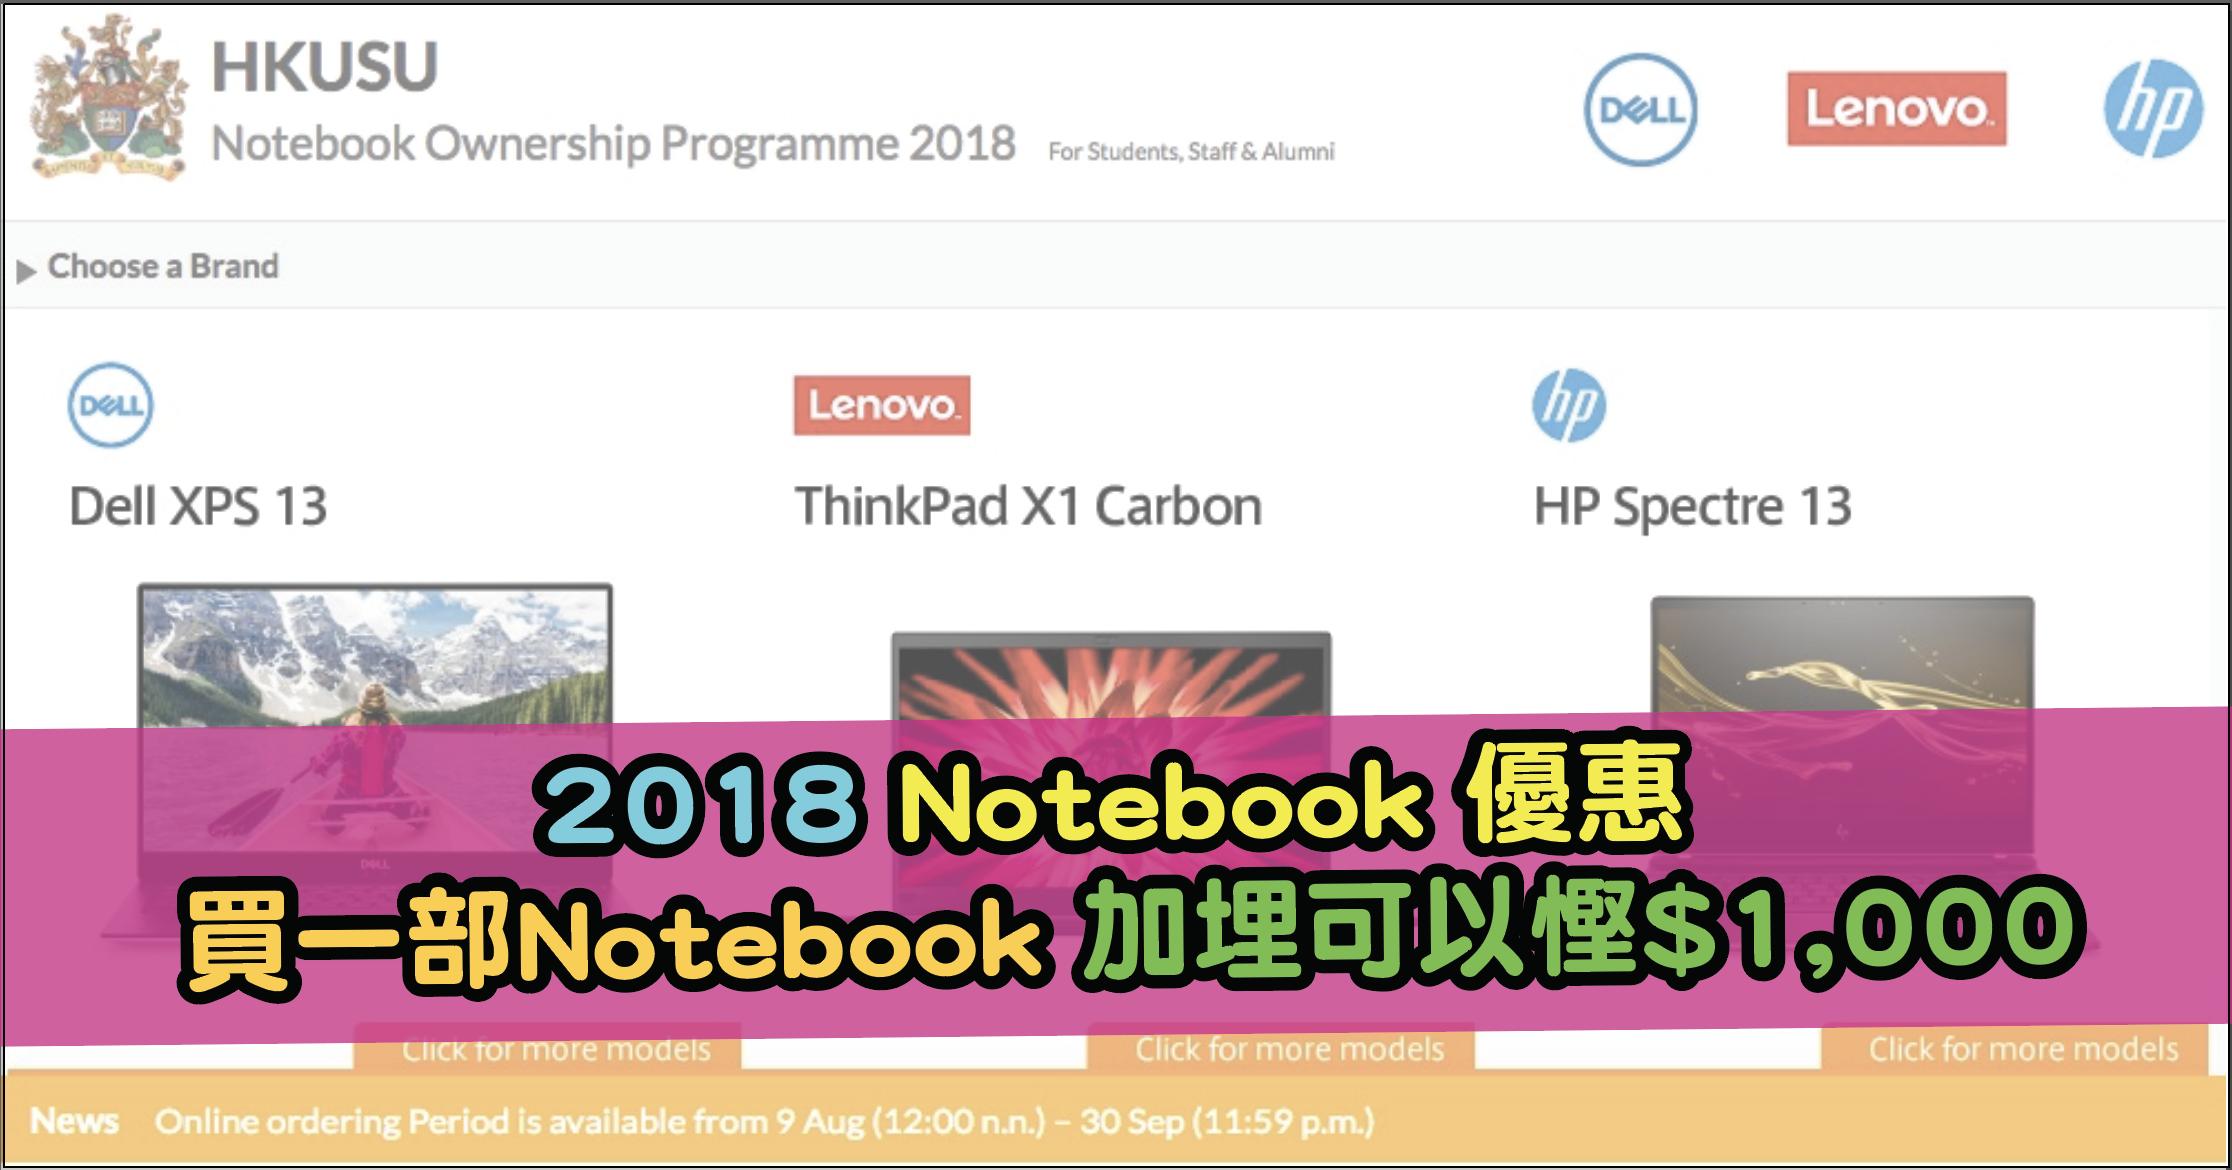 2018 Notebook 優惠!買一部Notebook 加埋可以慳$1,000!(銀聯買$6,000扣$300 + Wewa銀聯迎新$500 + 小斯額外$200)